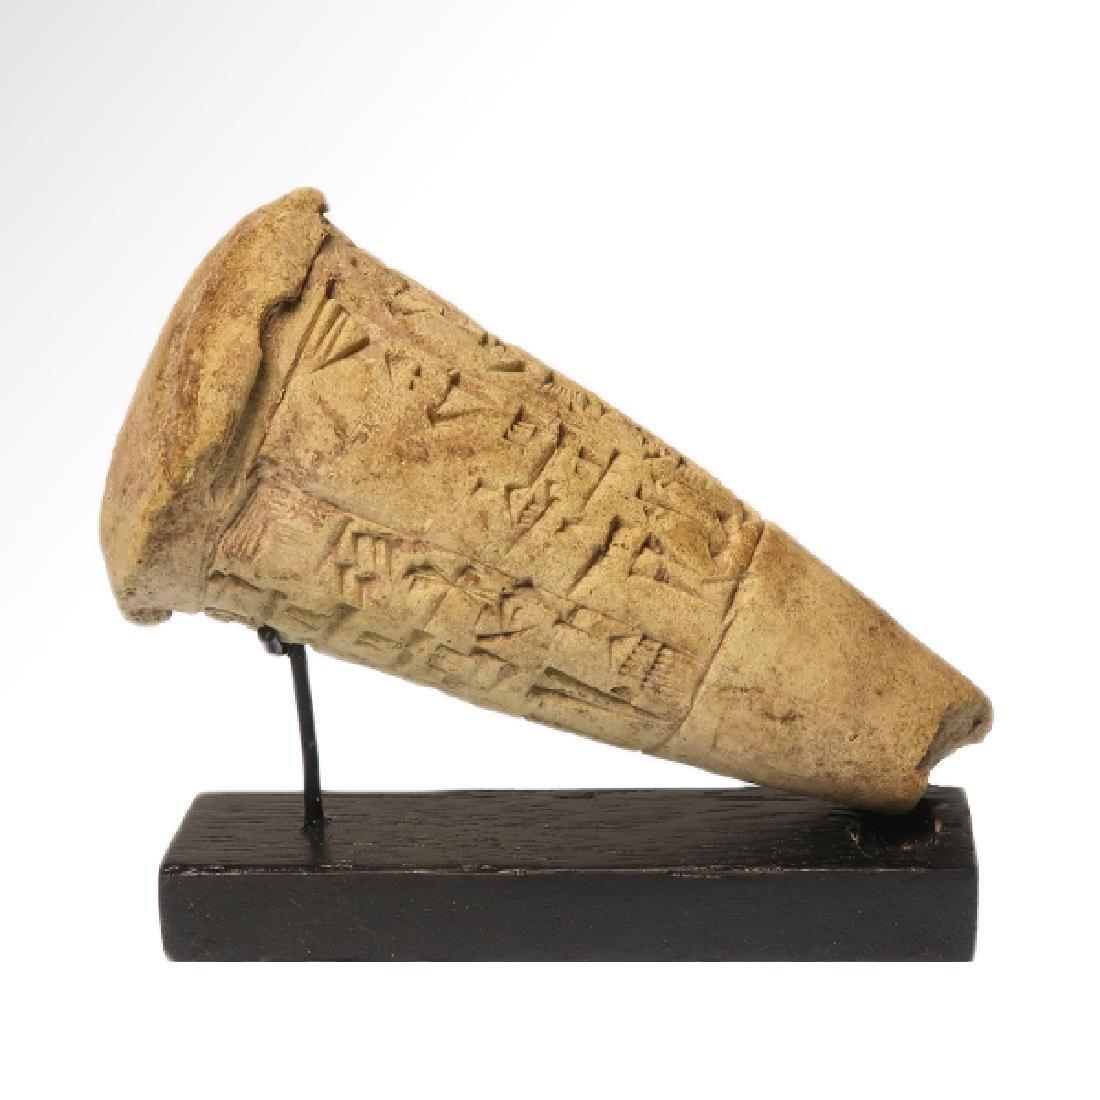 Sumerian Terracotta Dedication Foundation Cone - 2